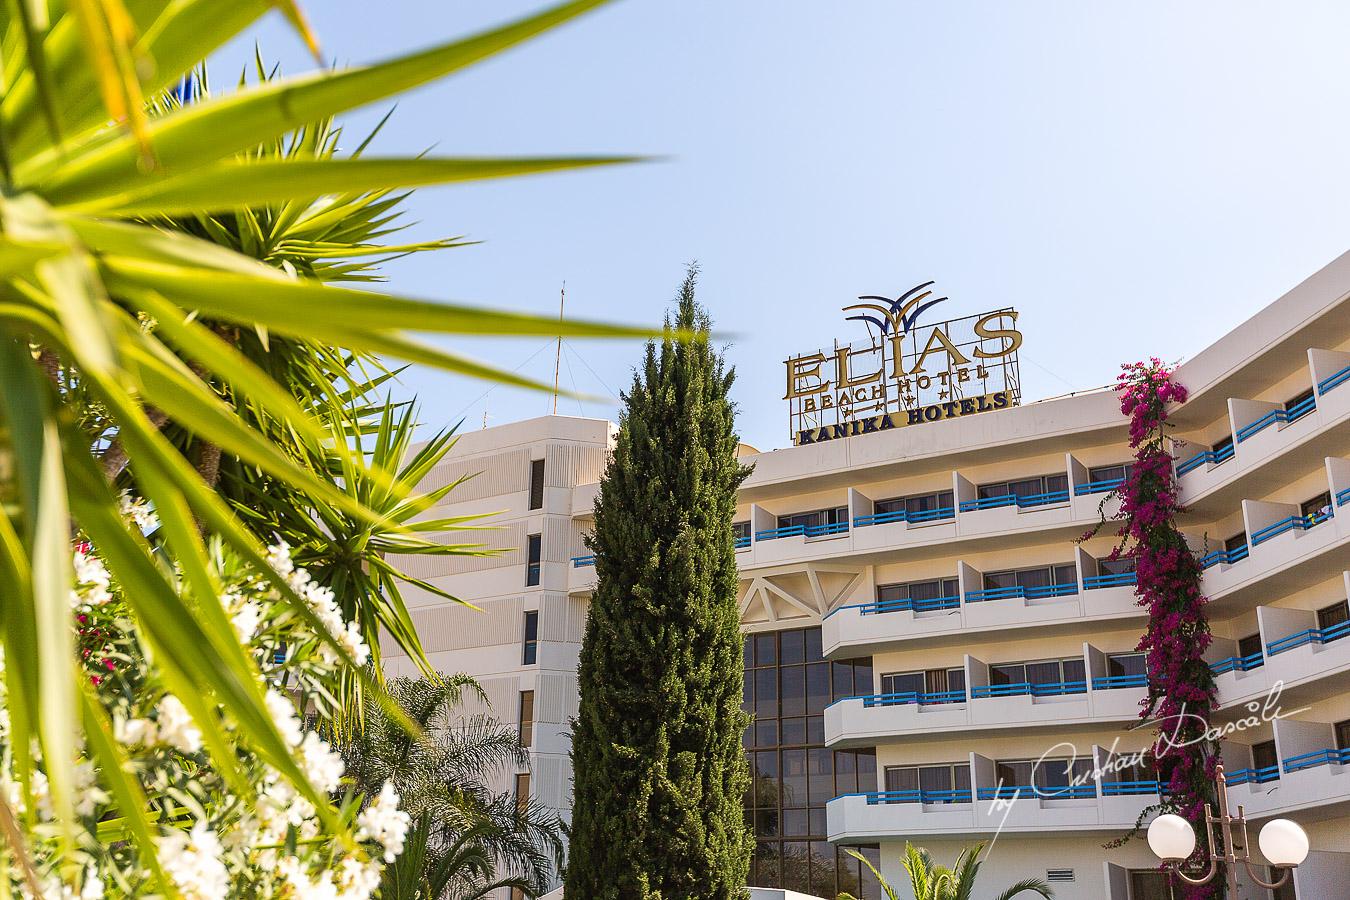 Elias Beach Hotel Limassol - Entrance View